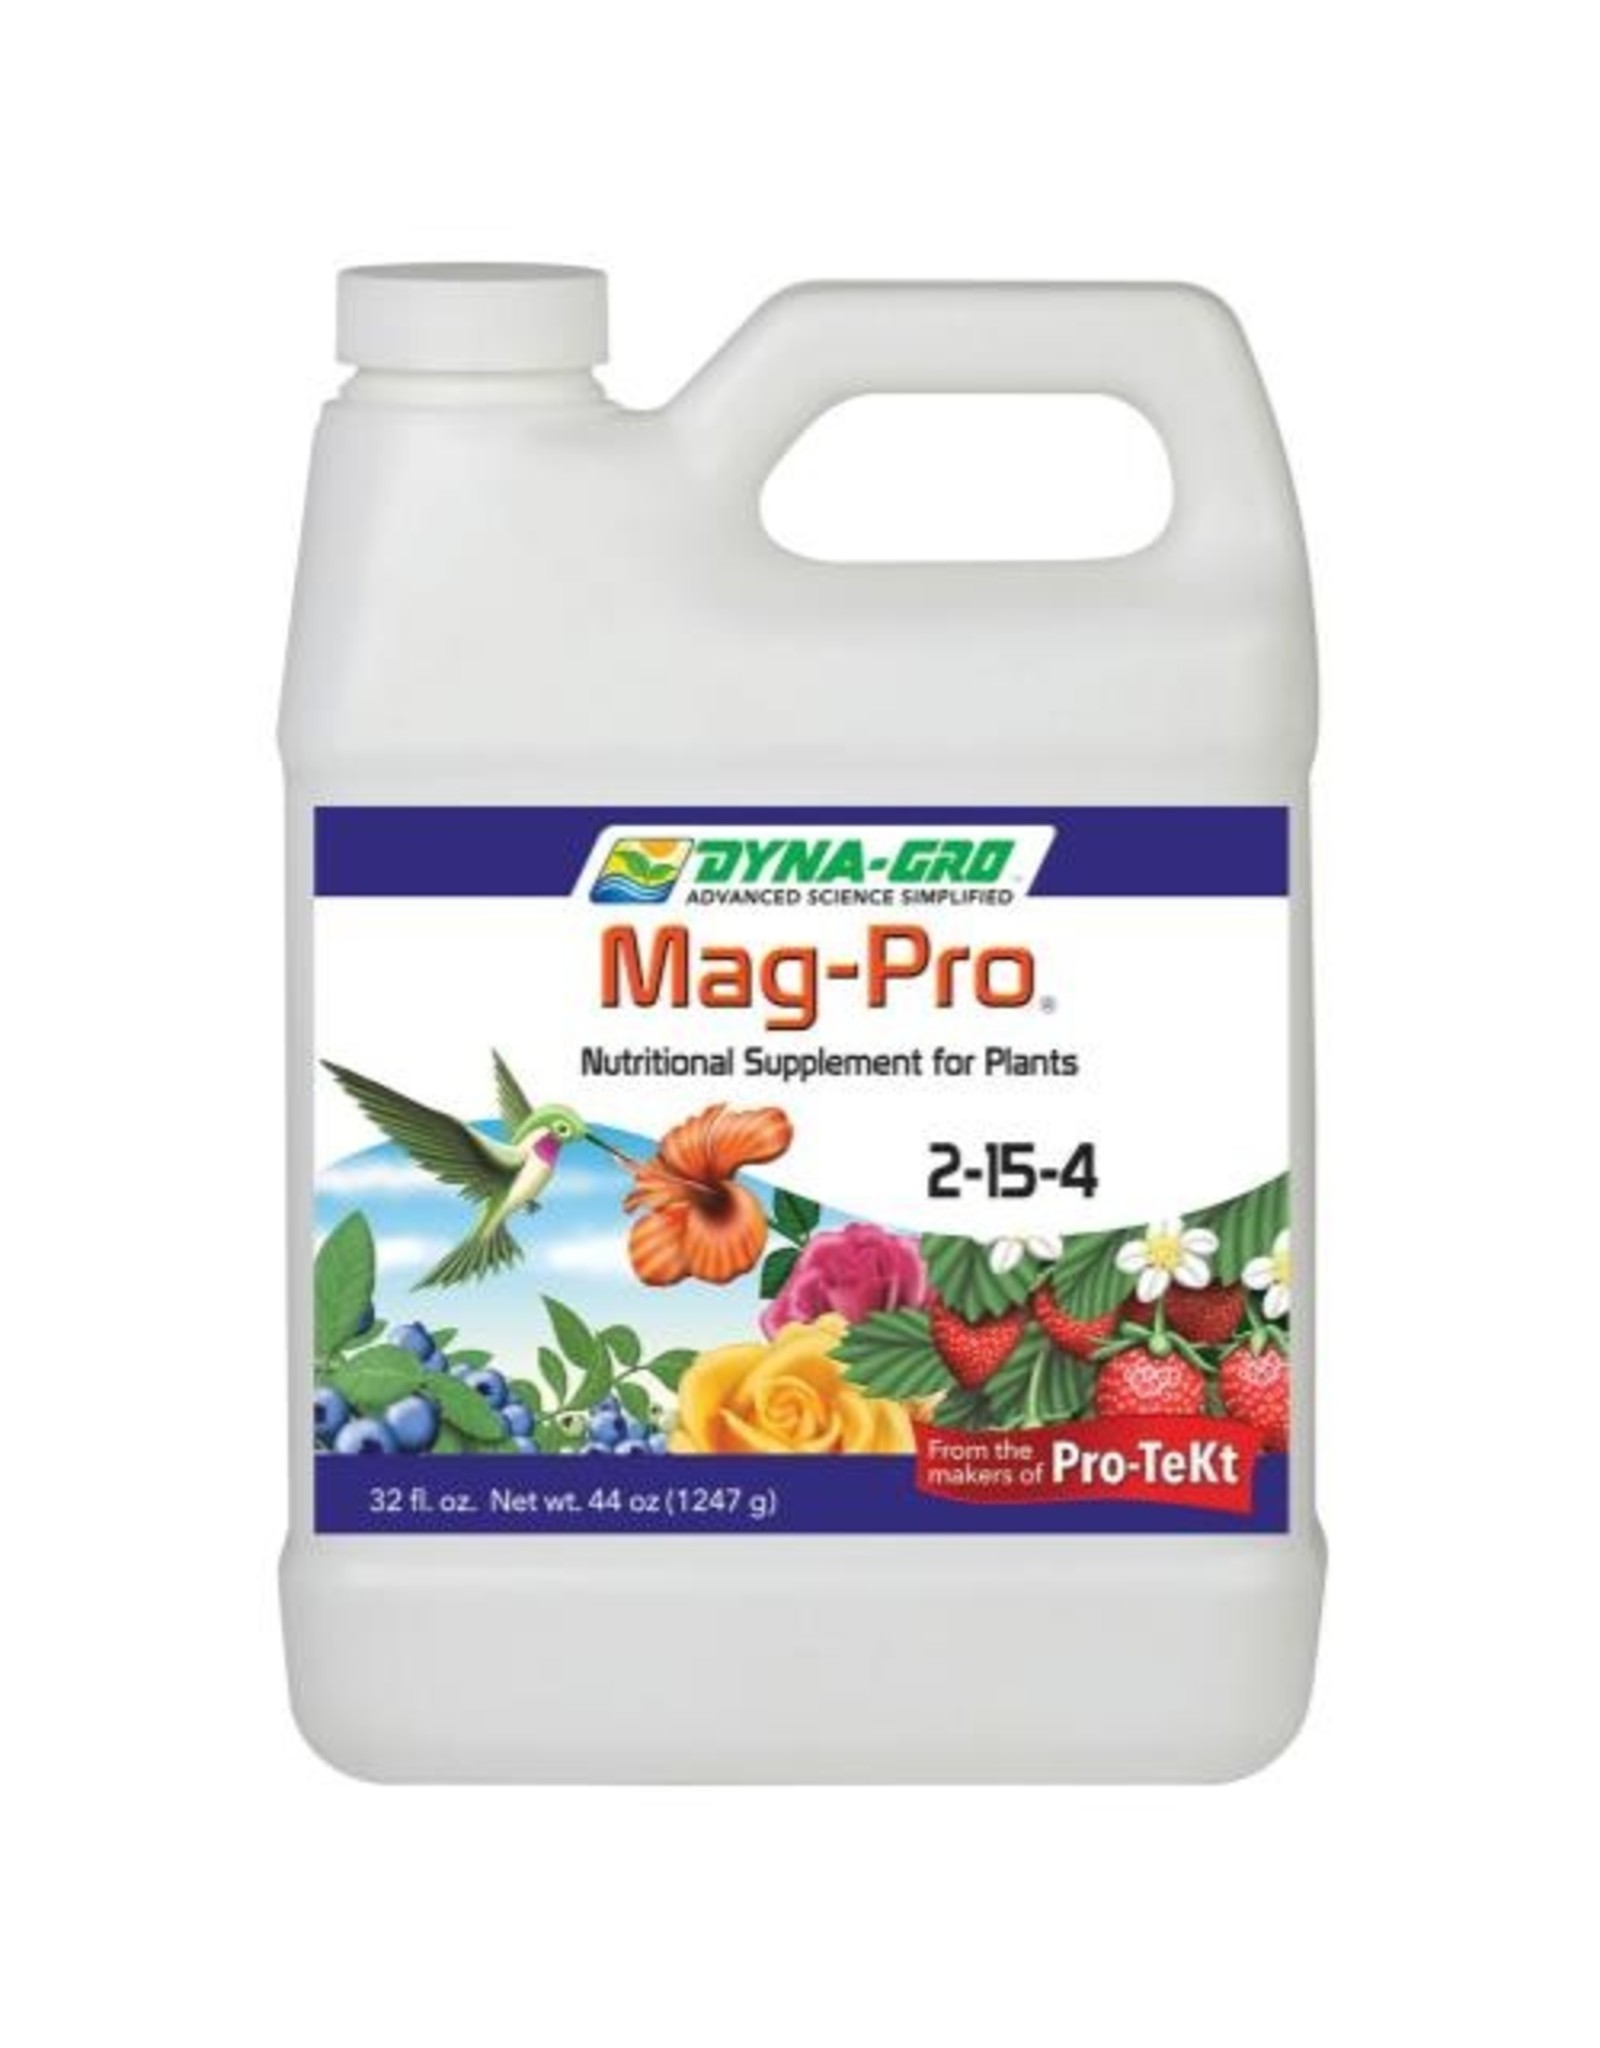 Dyna Gro Dyna-Gro Mag-Pro Quart